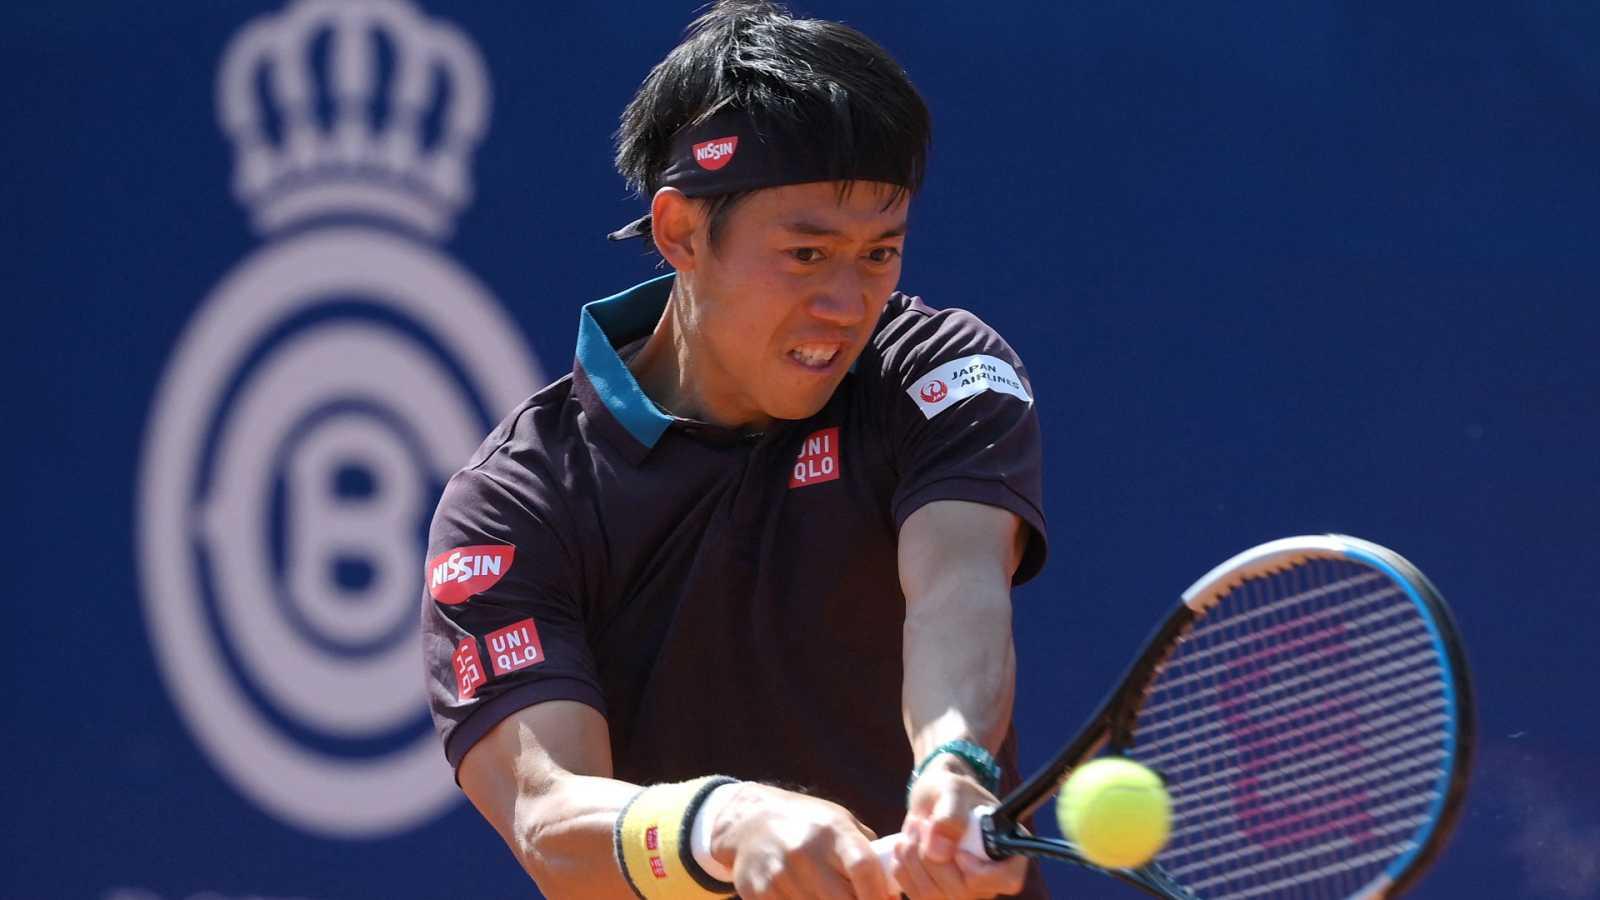 Tenis - ATP 500 Trofeo Conde de Godó. 3º partido: K. Nishikori - G. Pella - ver ahora